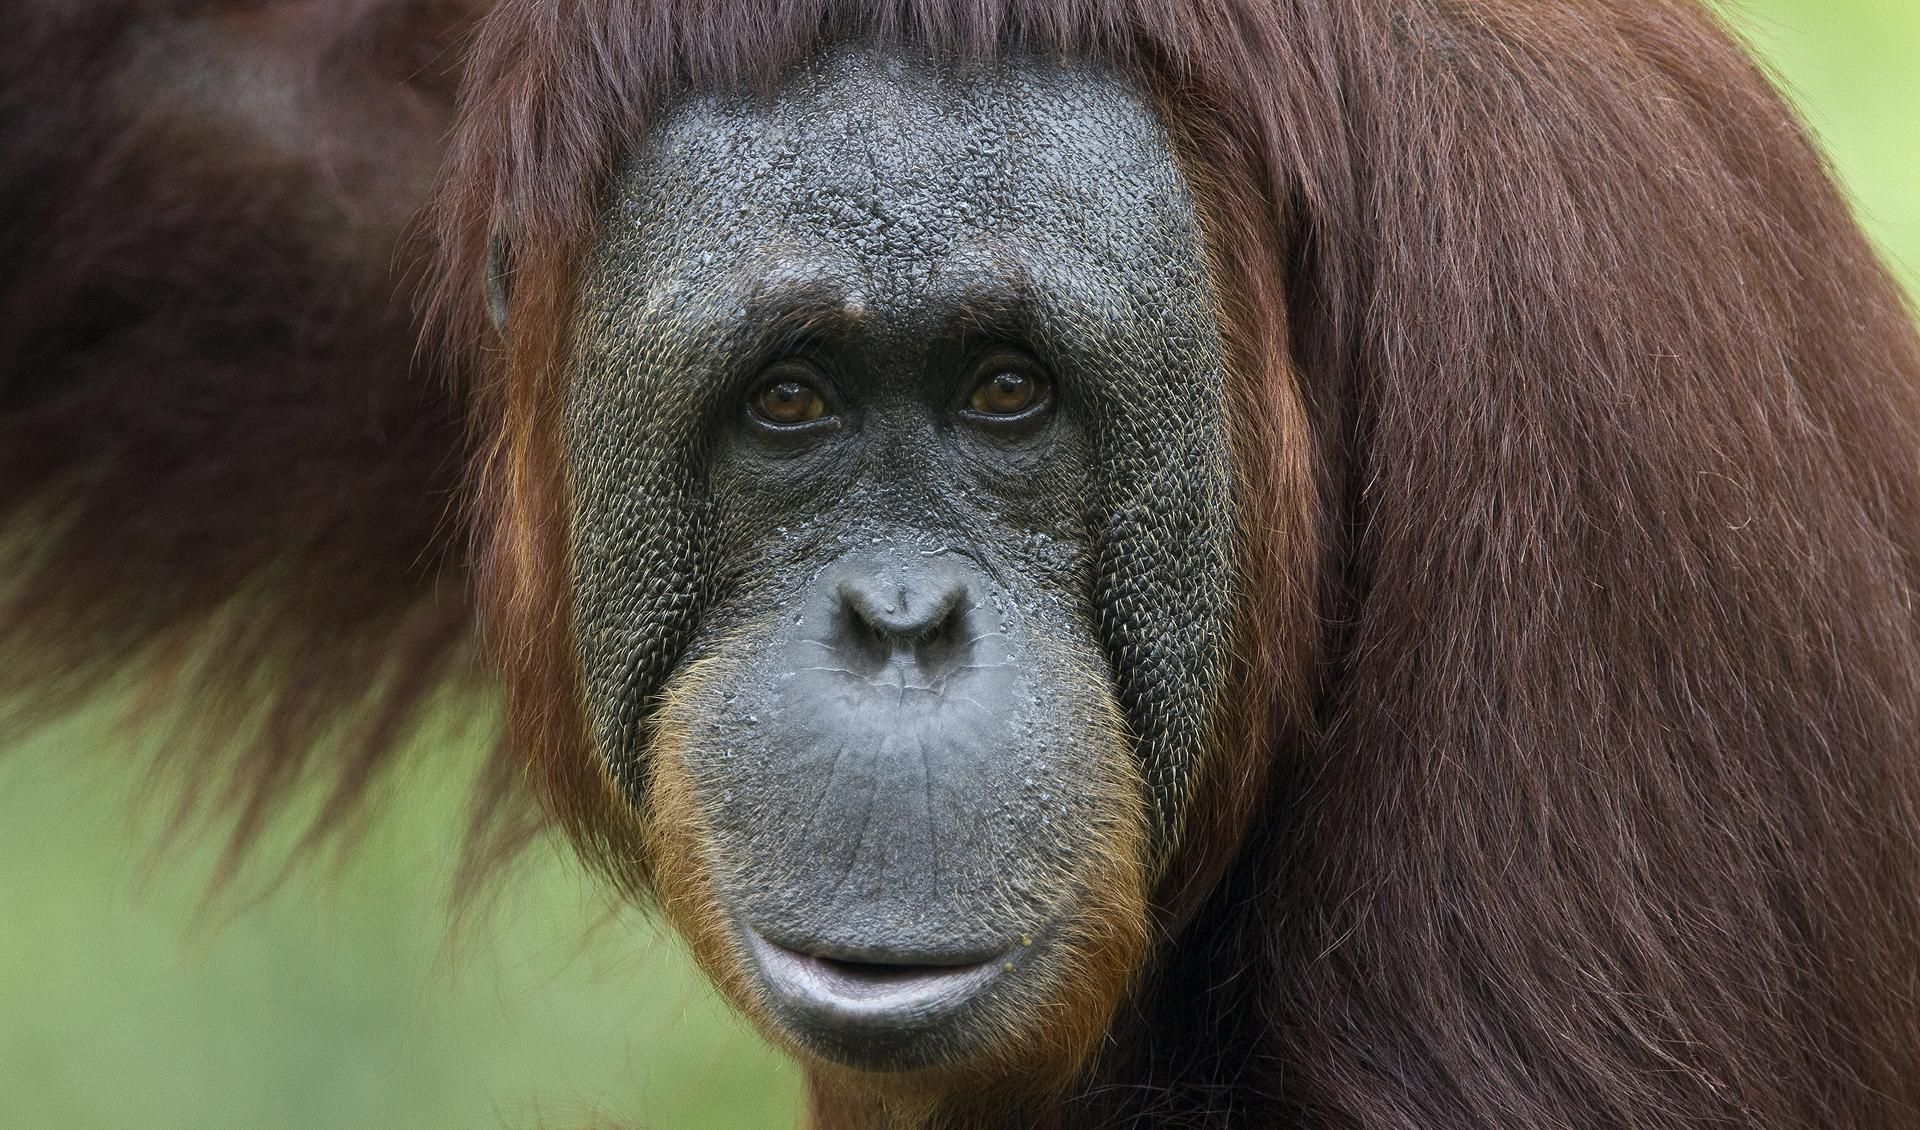 Orangutan Hd Wallpapers Animal Wallpapers Pinterest Monkey